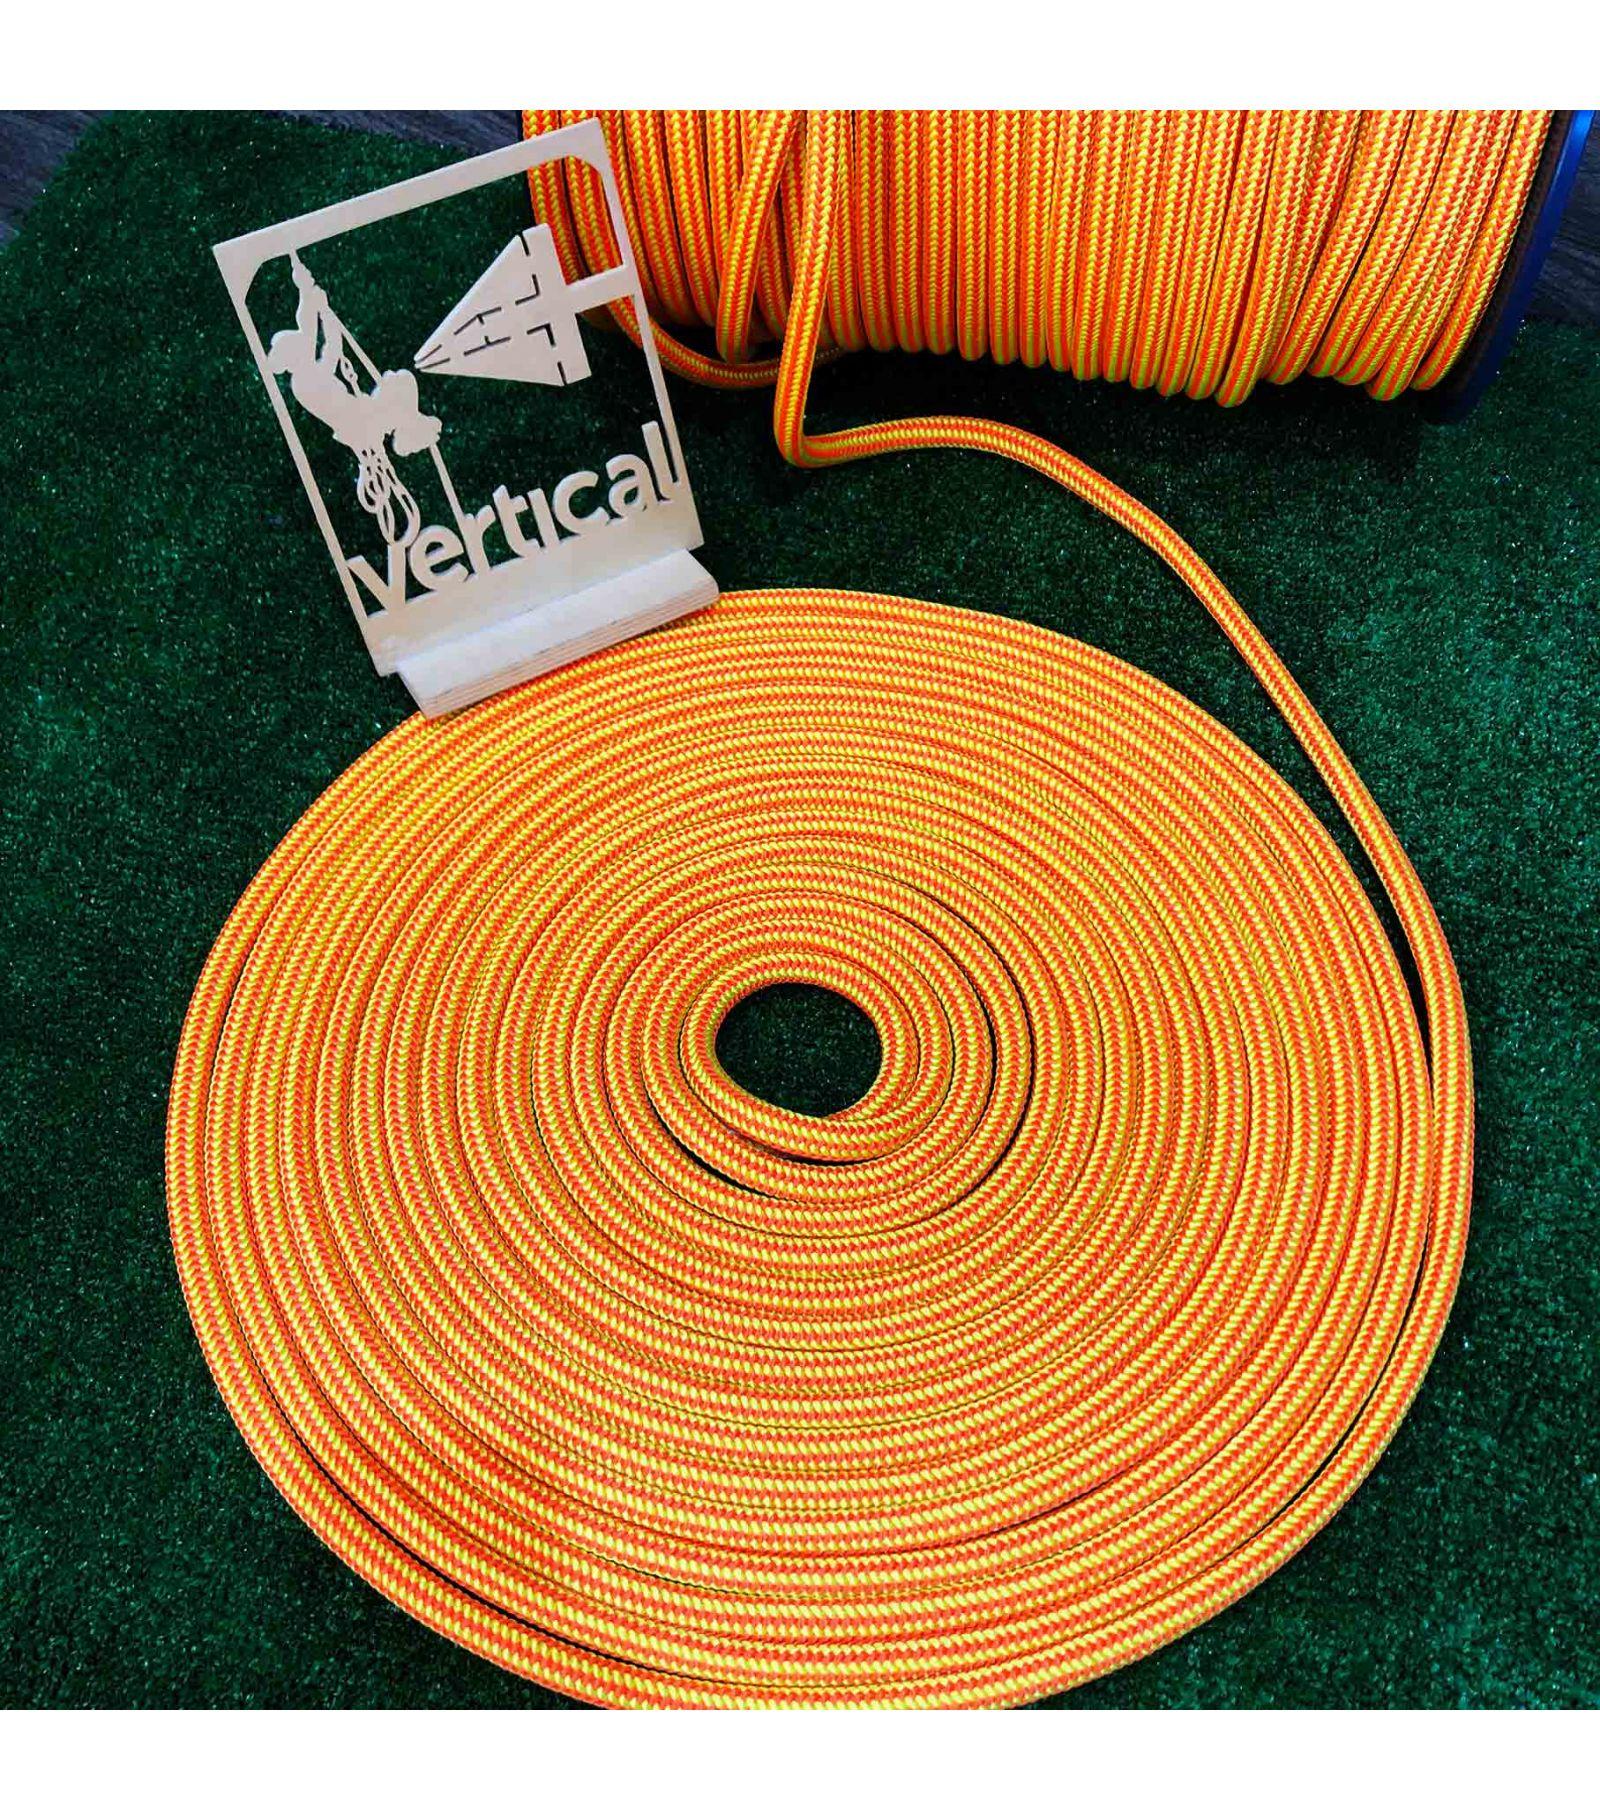 Cuerda timber evo 11 5m amarillo naranja tendon - Amarillo naranja ...